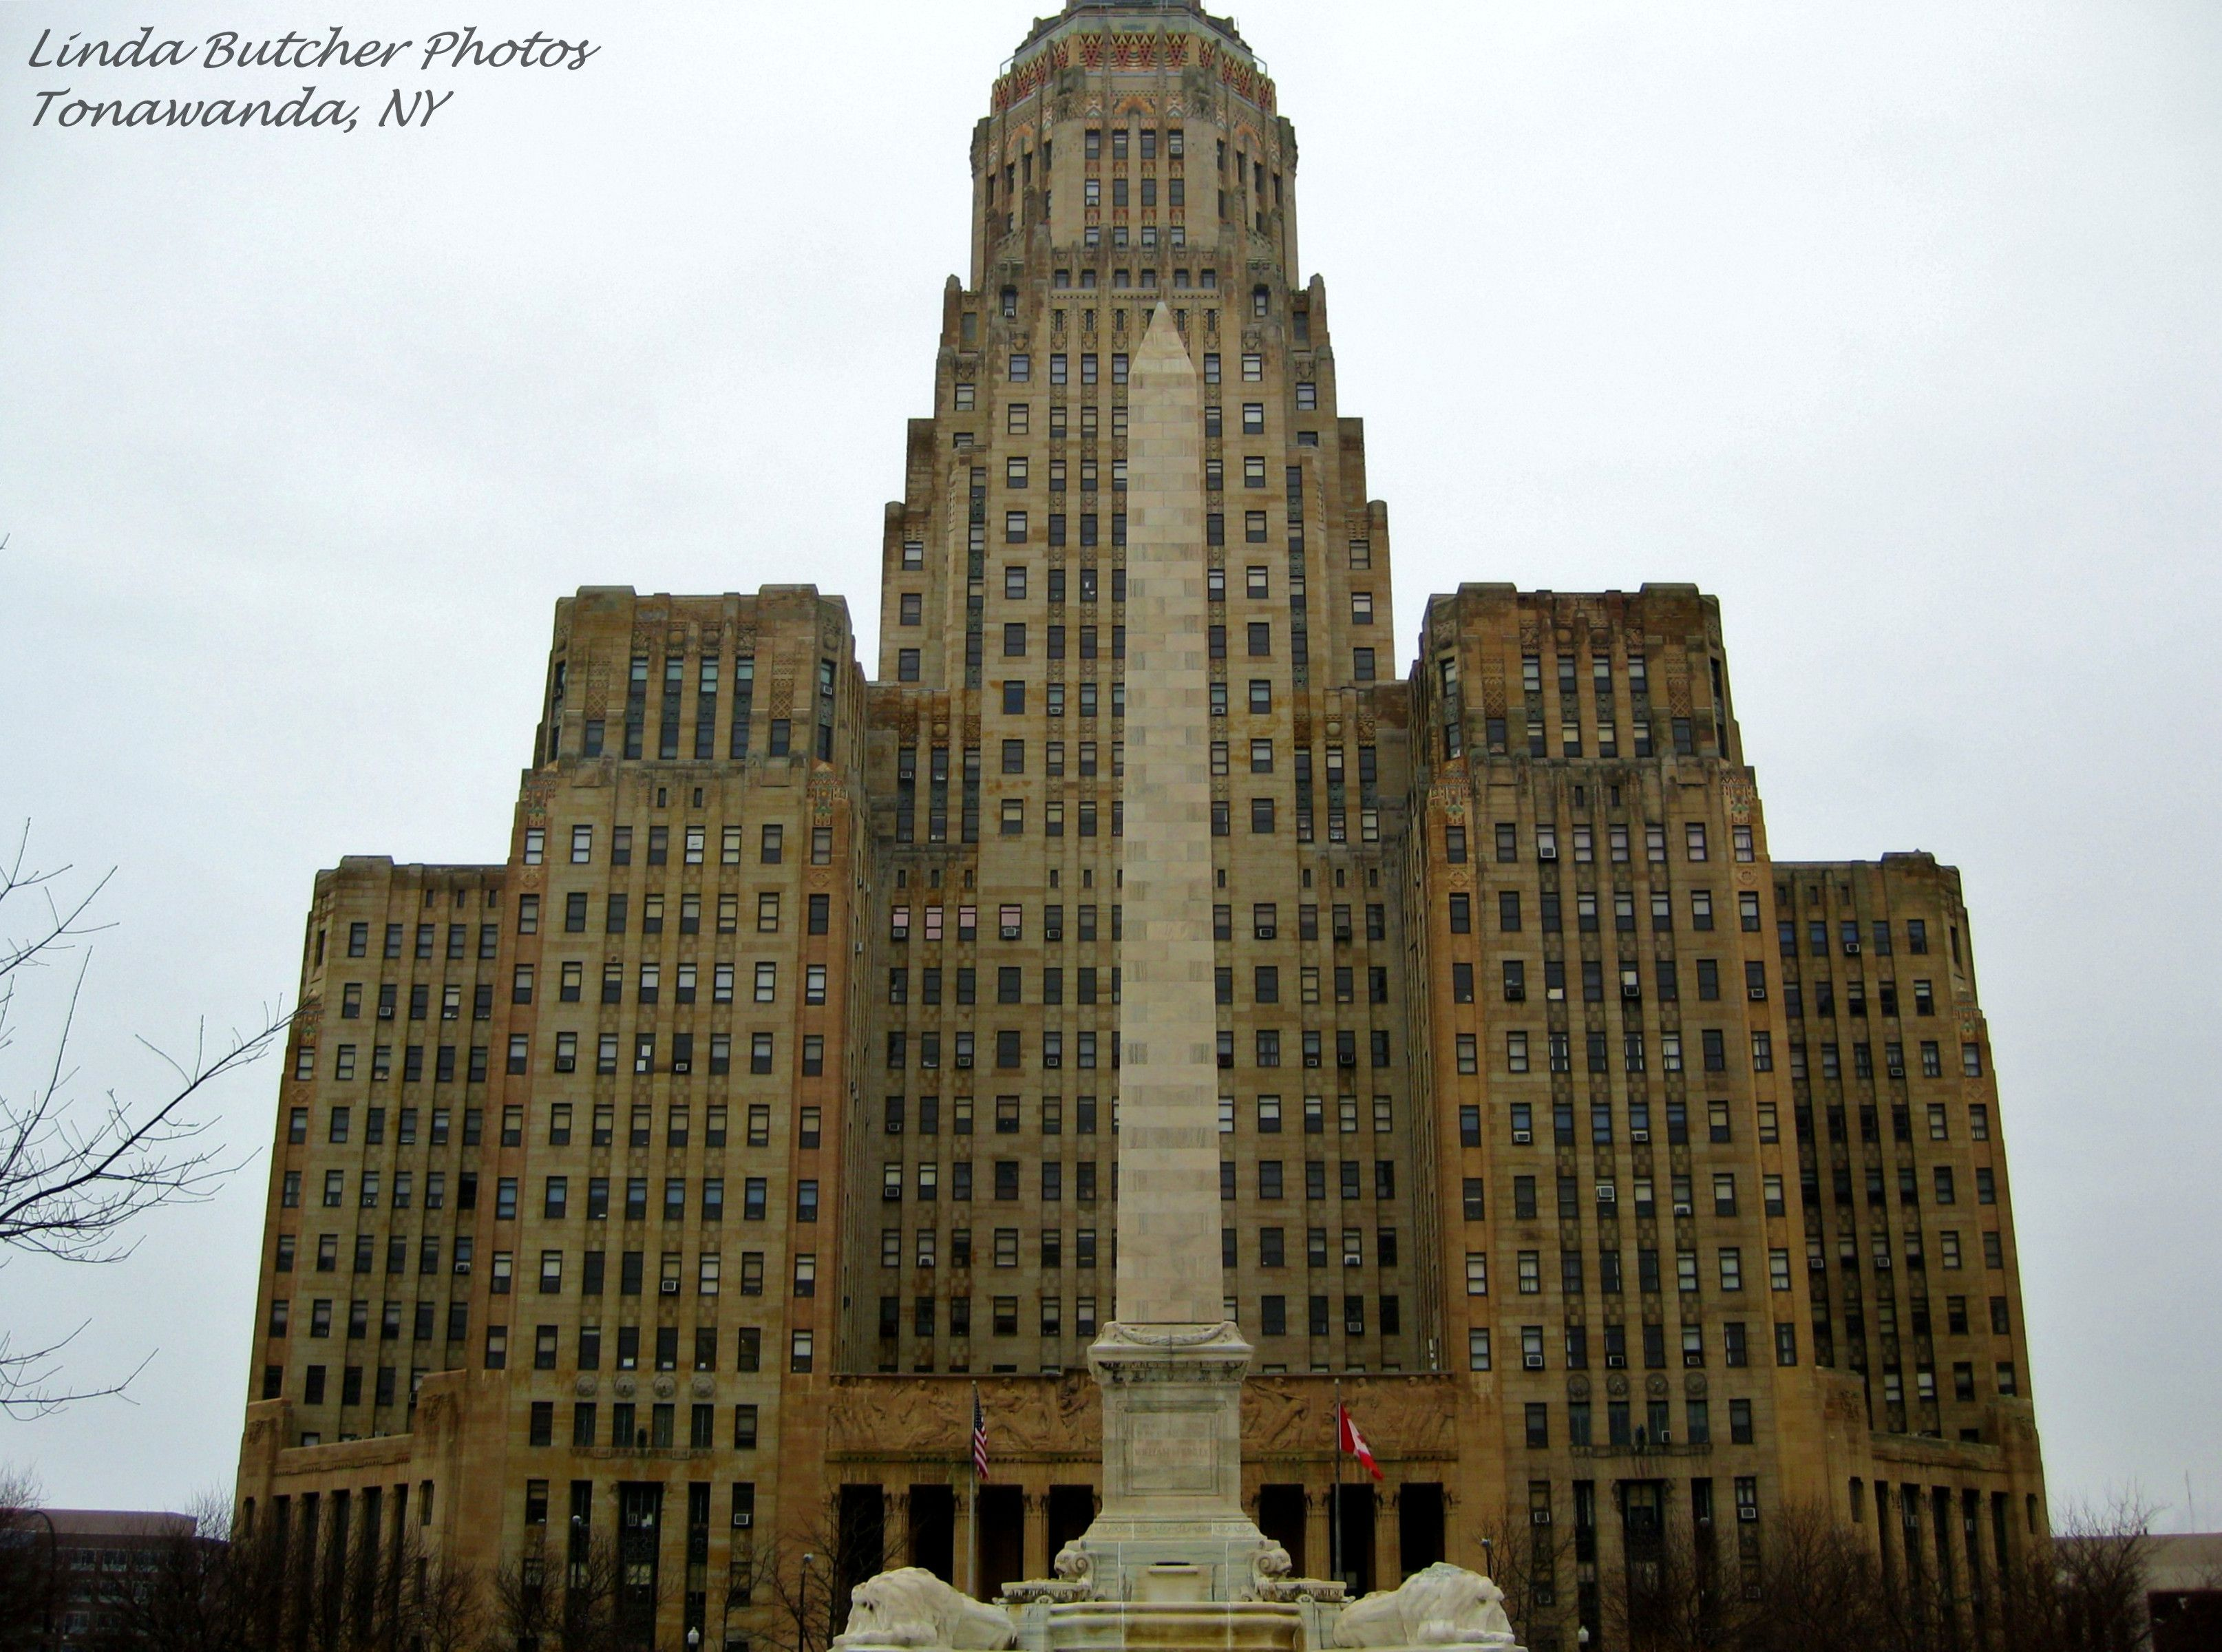 City Hall 2011